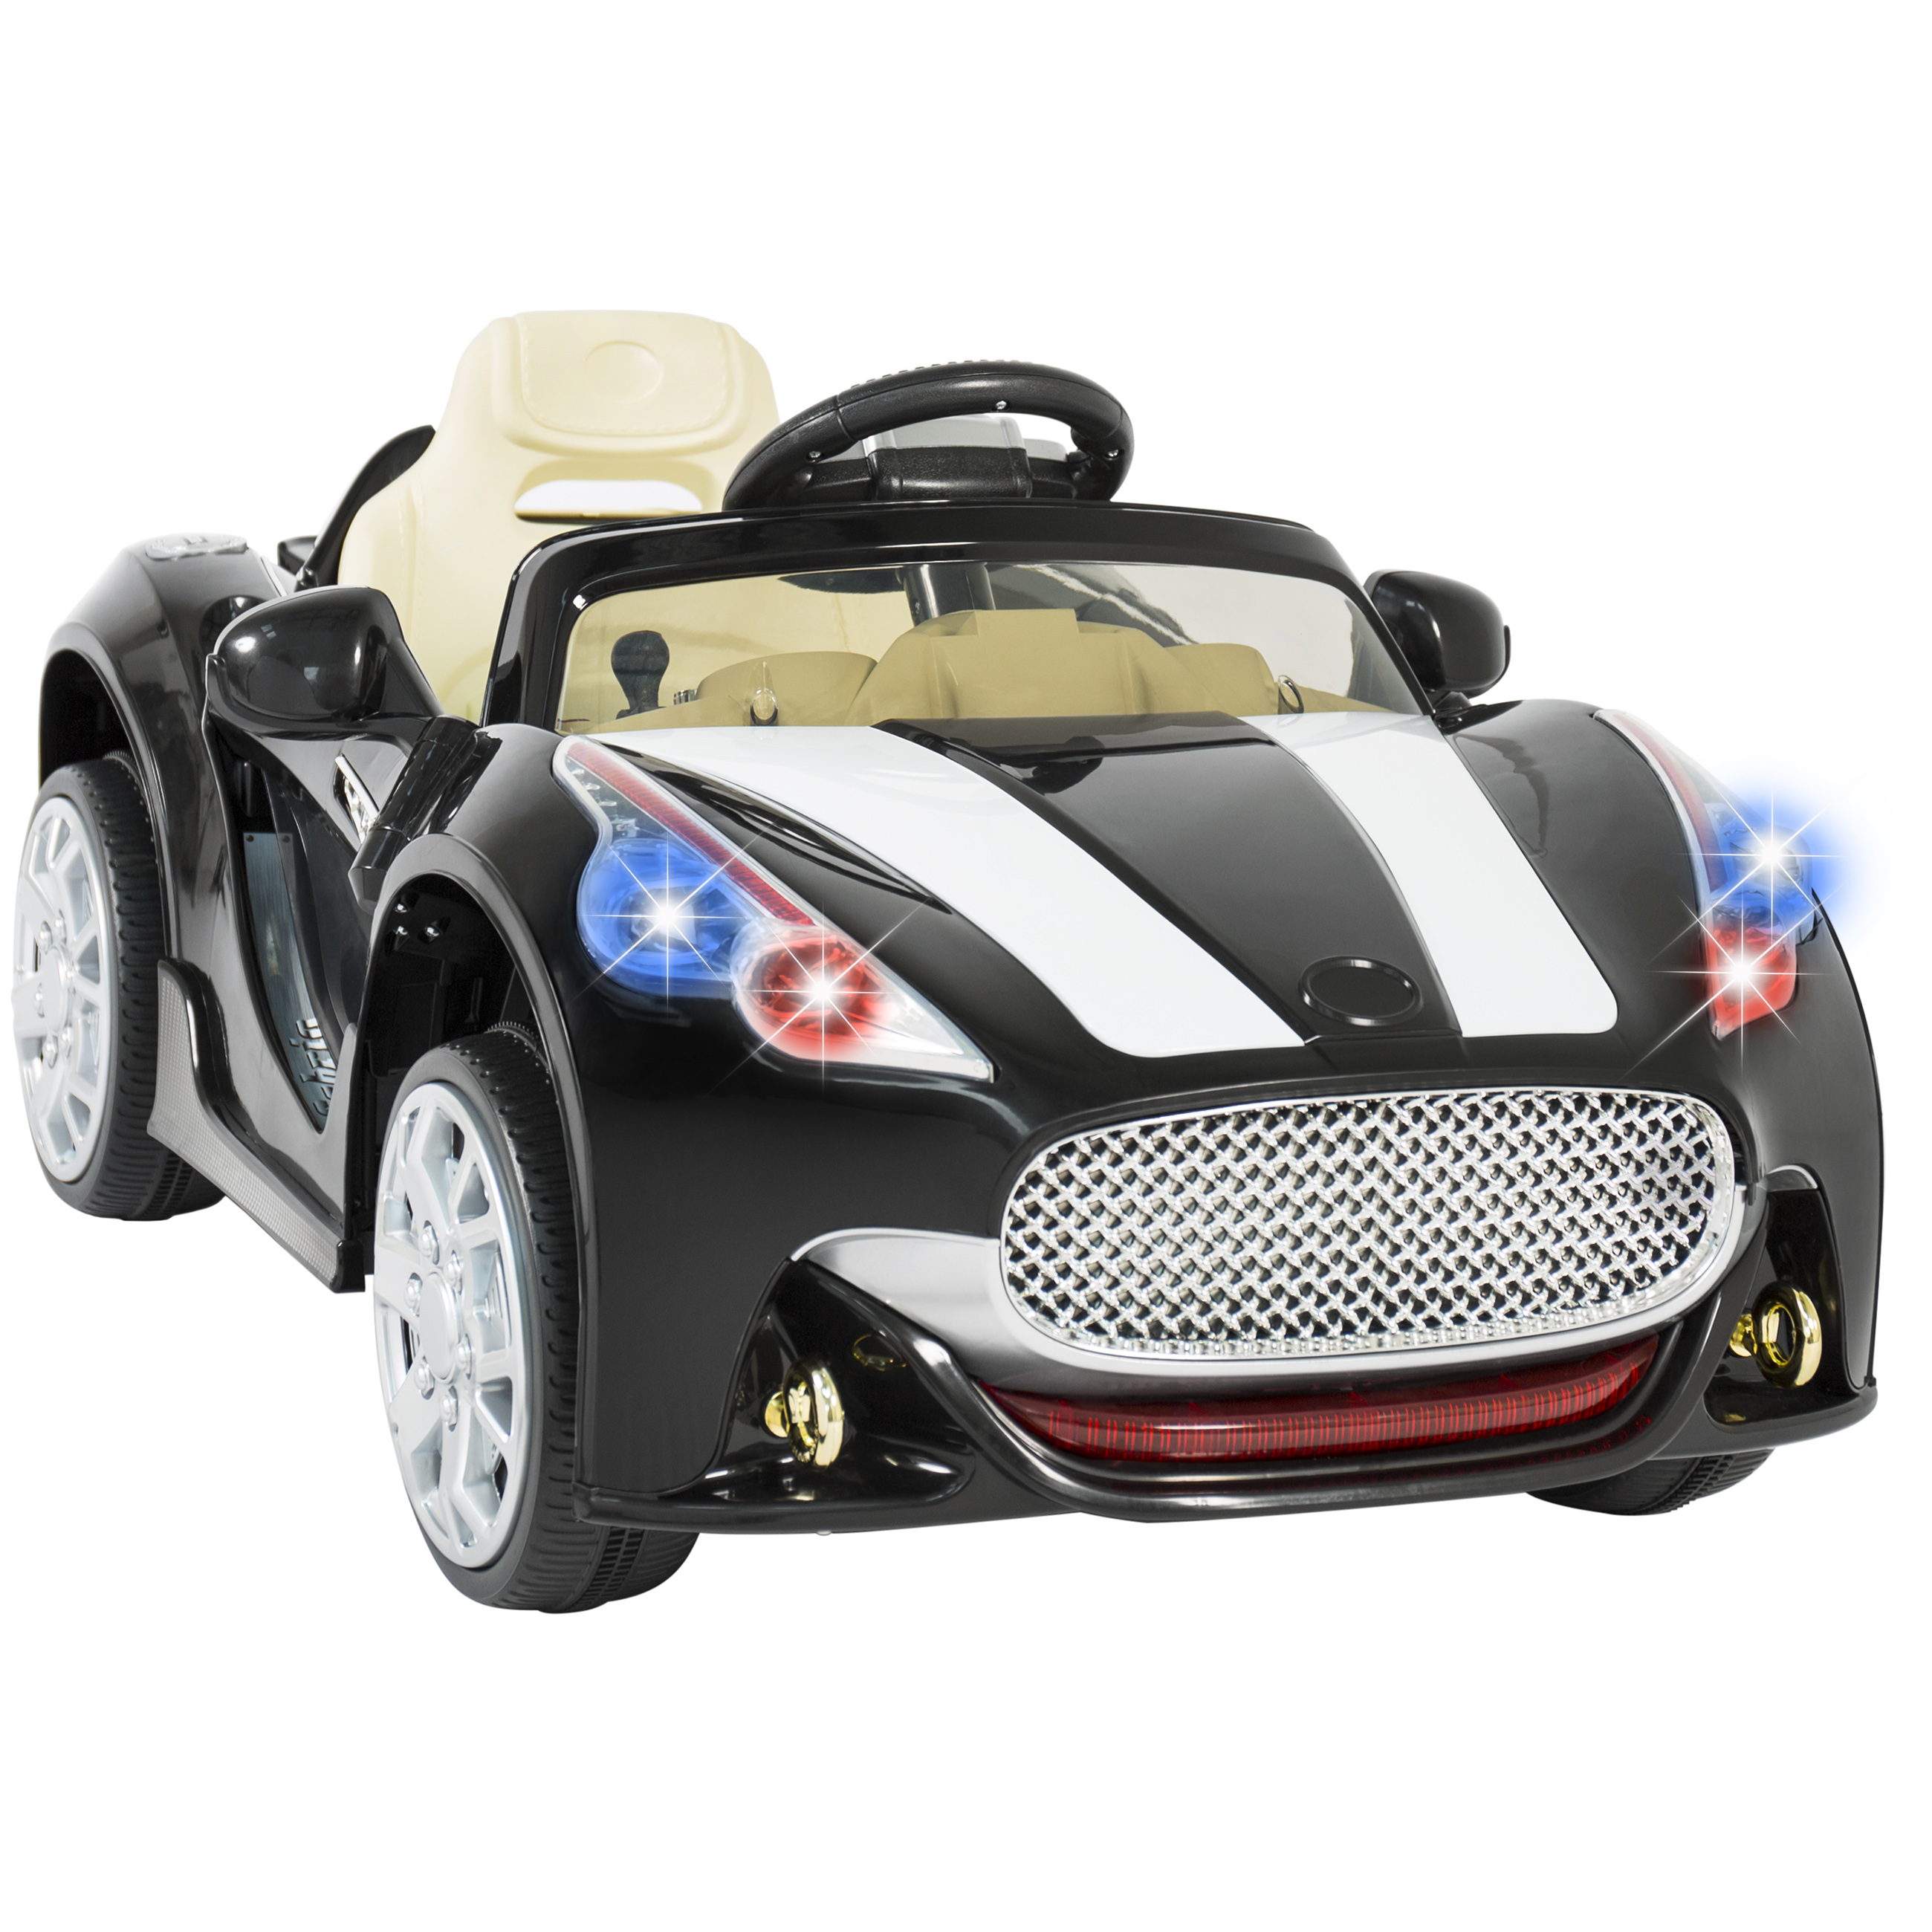 12v ride on car kids rc remote control electric battery power w radio mp3 bk